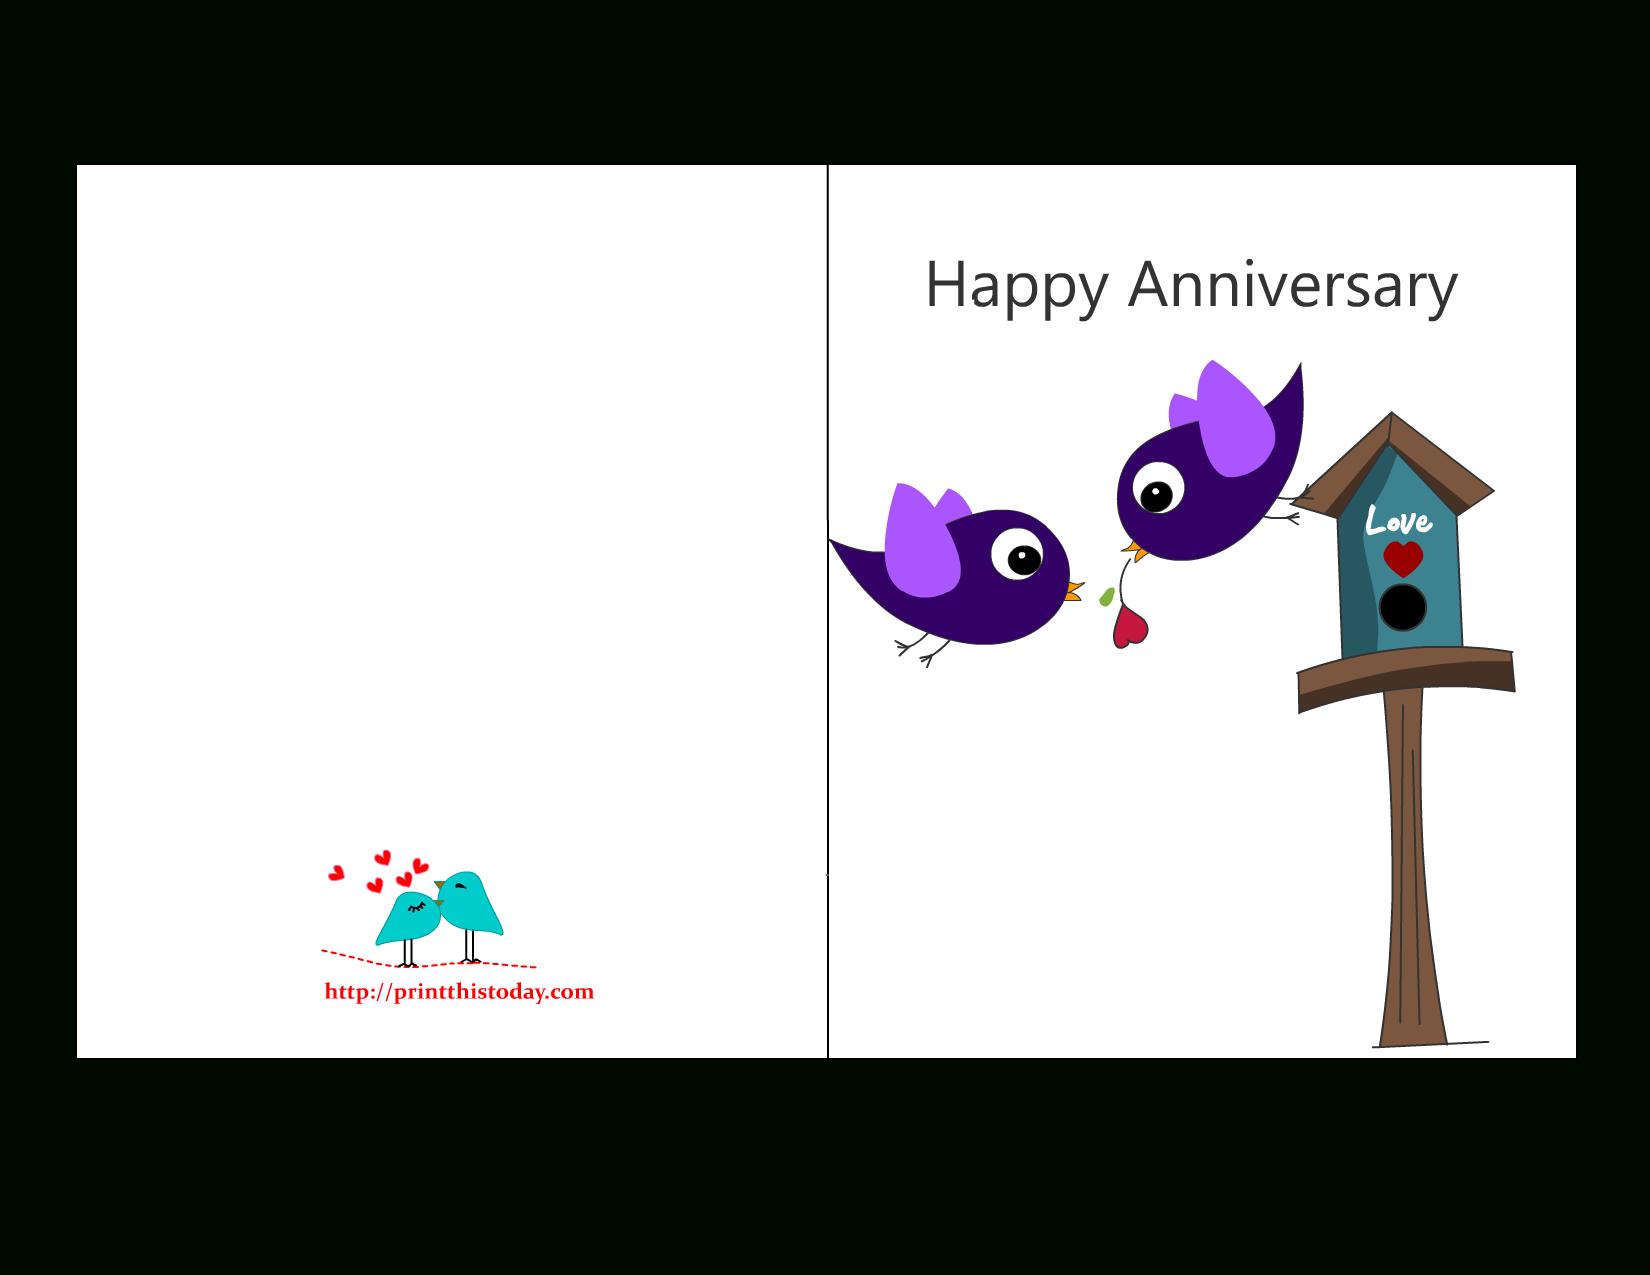 Free Anniversary Cards To Print | Free Printable Anniversary Cards - Free Anniversary Printables